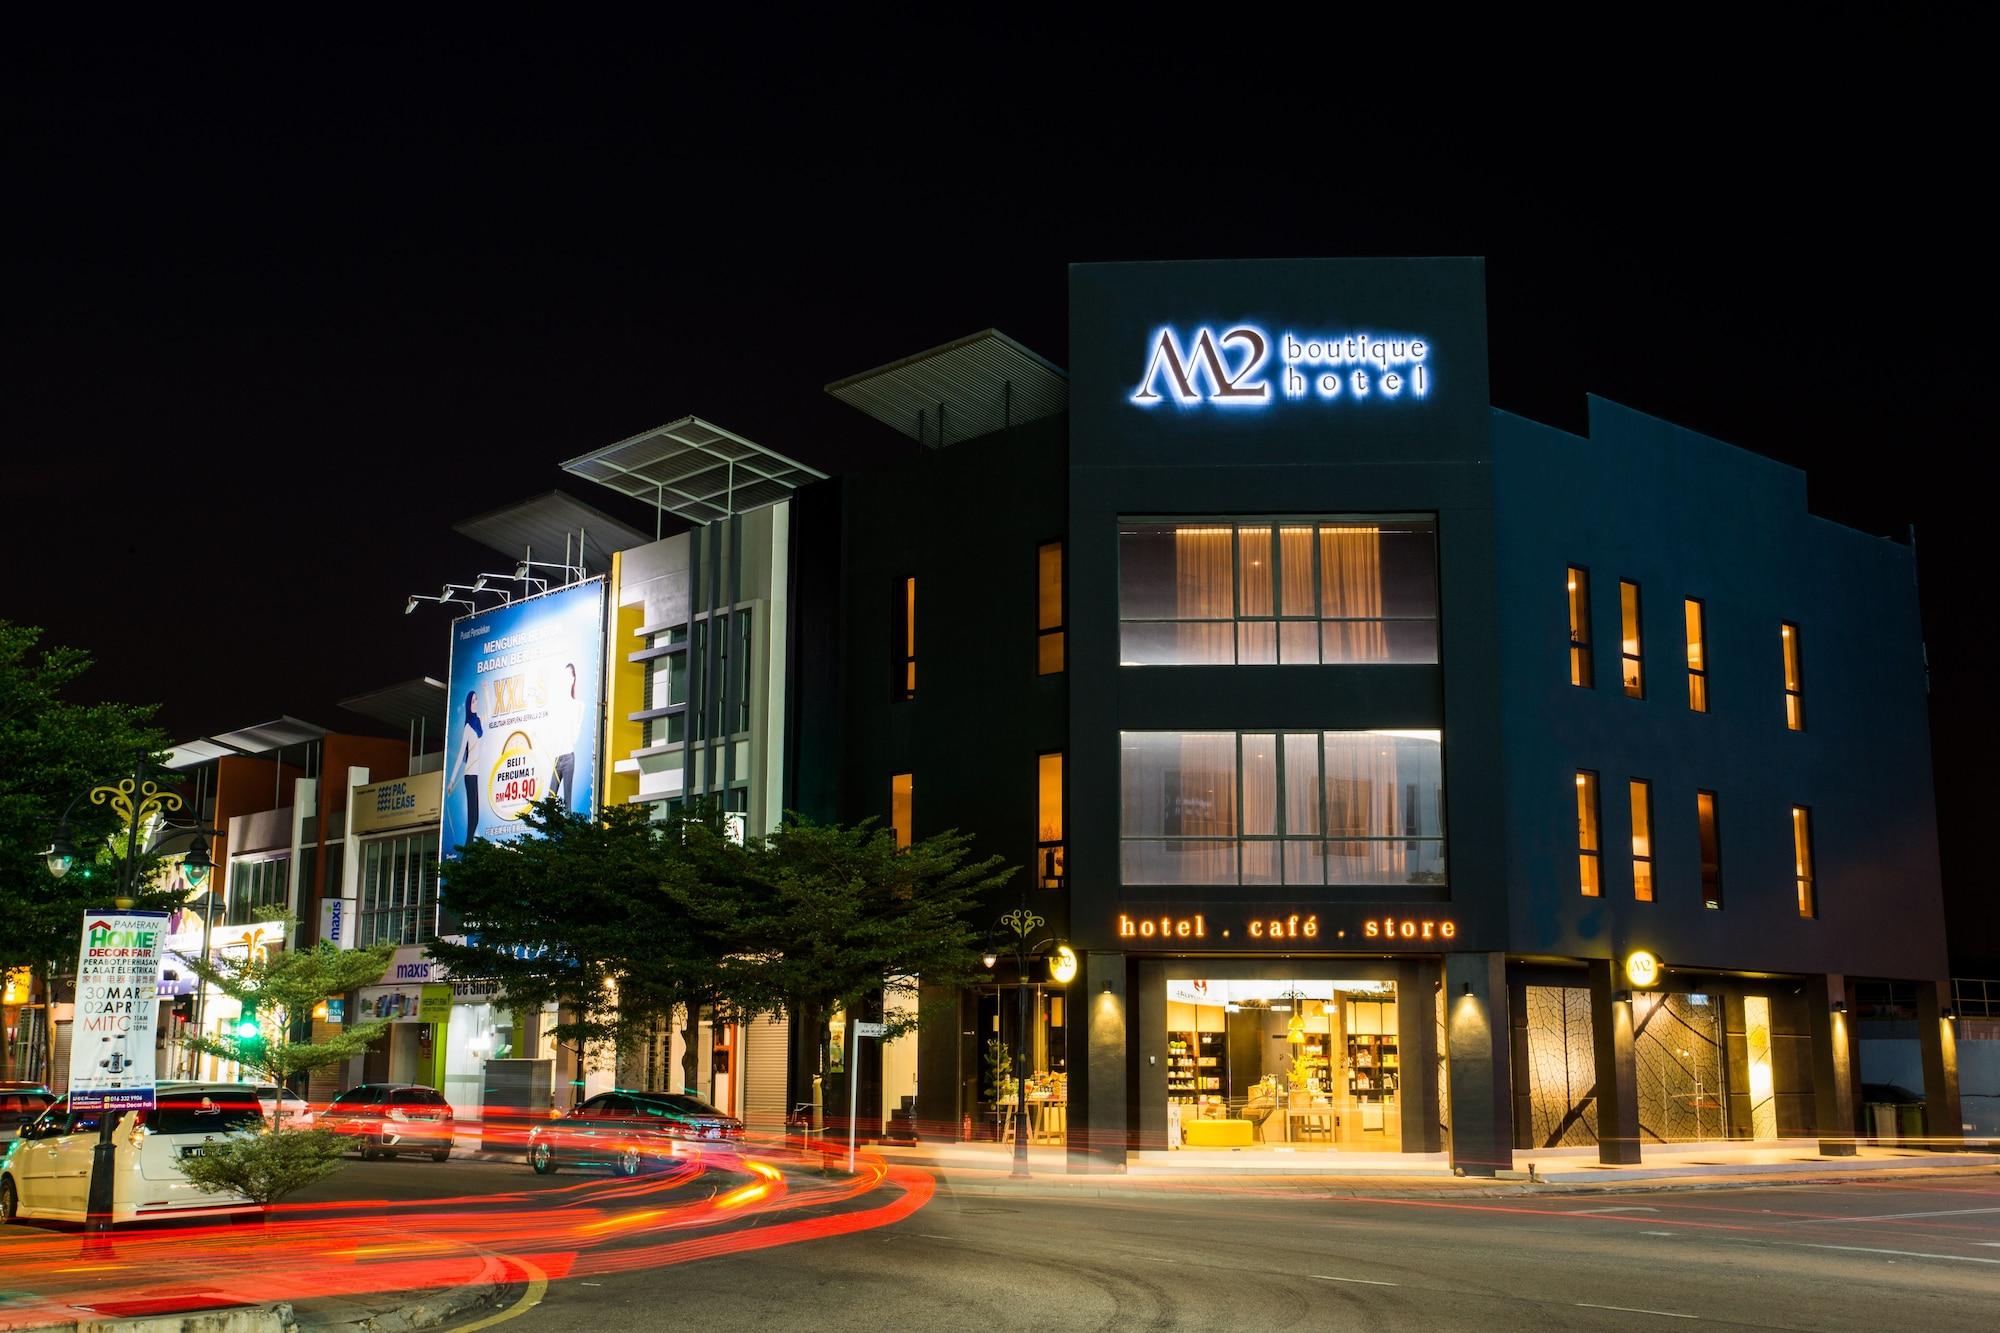 M2 Boutique Hotel, Kota Melaka